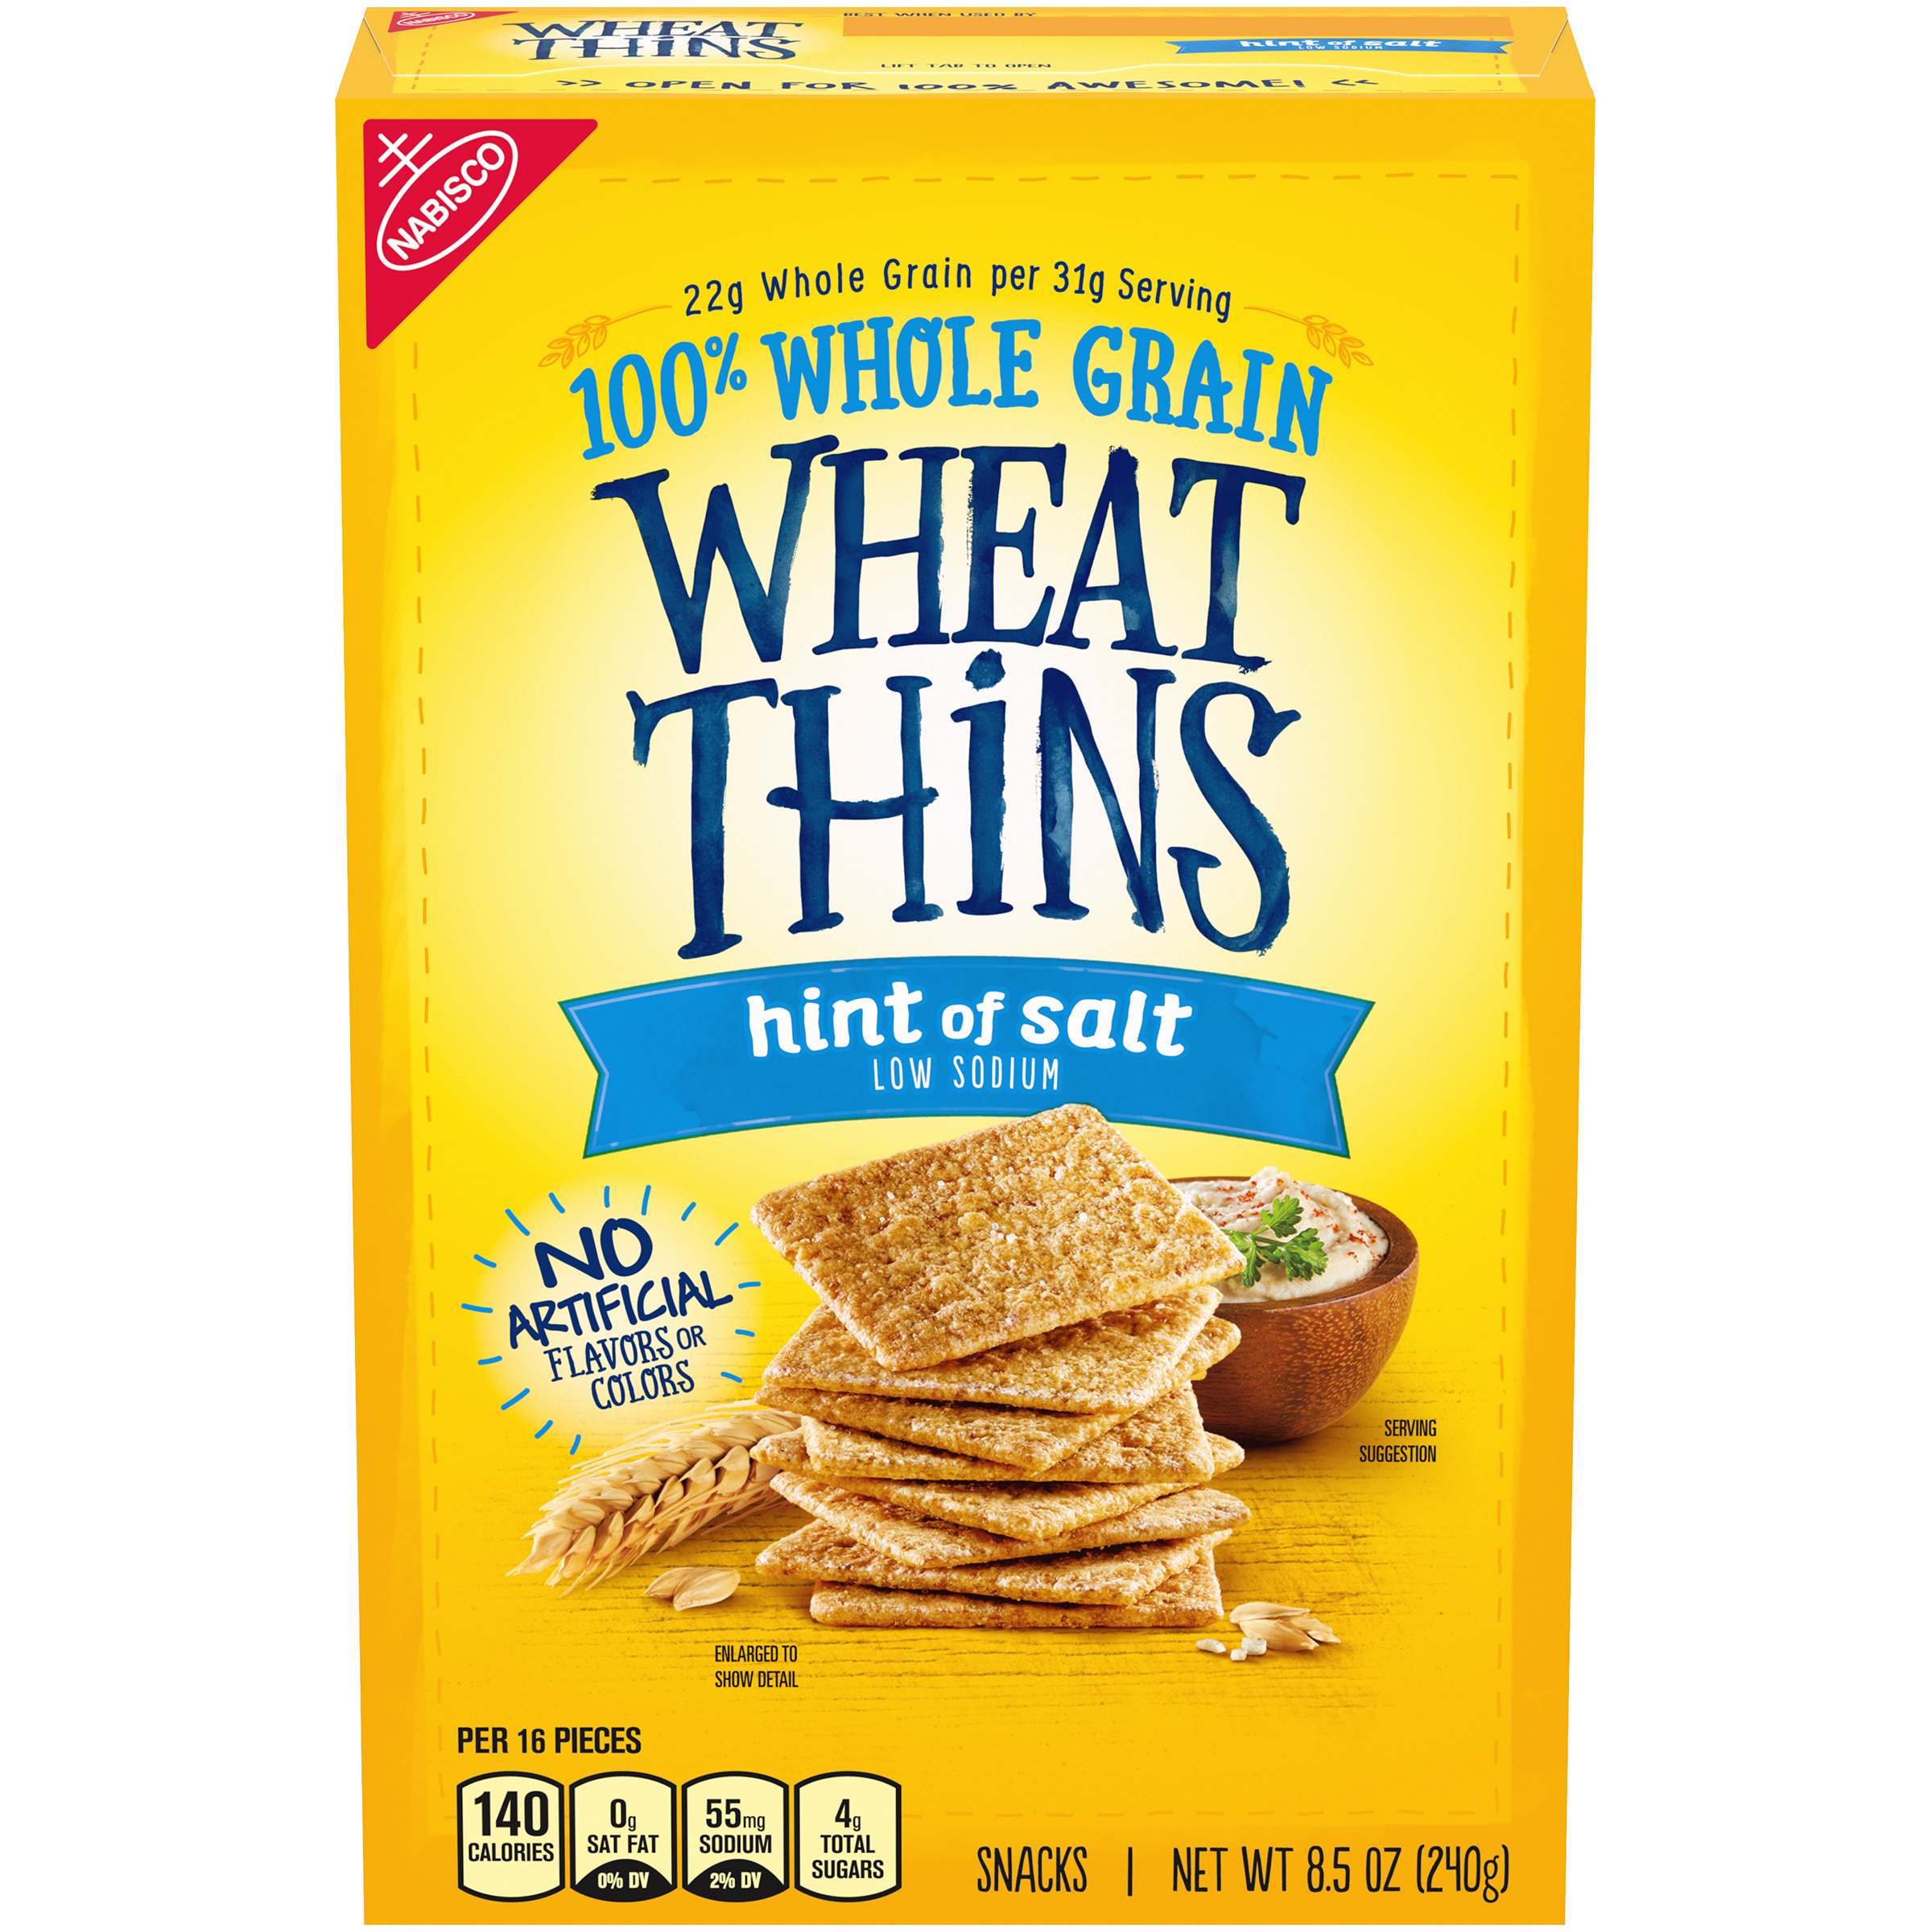 WHEAT THINS Hint Of Salt Crackers 8.5 Oz